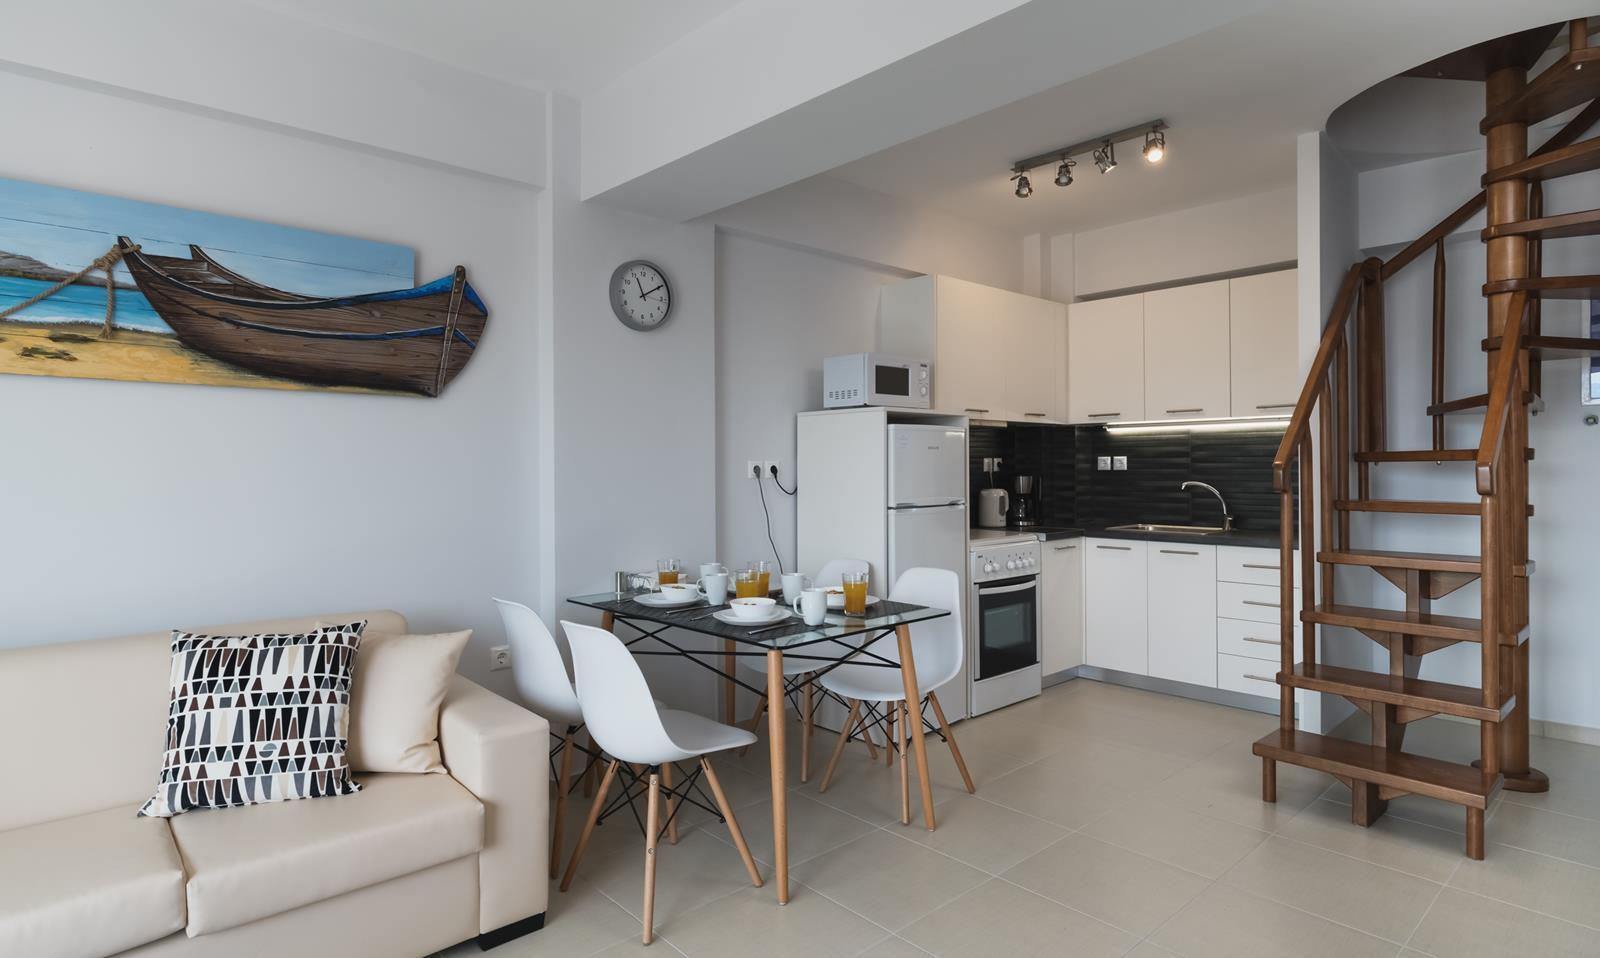 apartments athens greece - Alekos Apartments & Suites